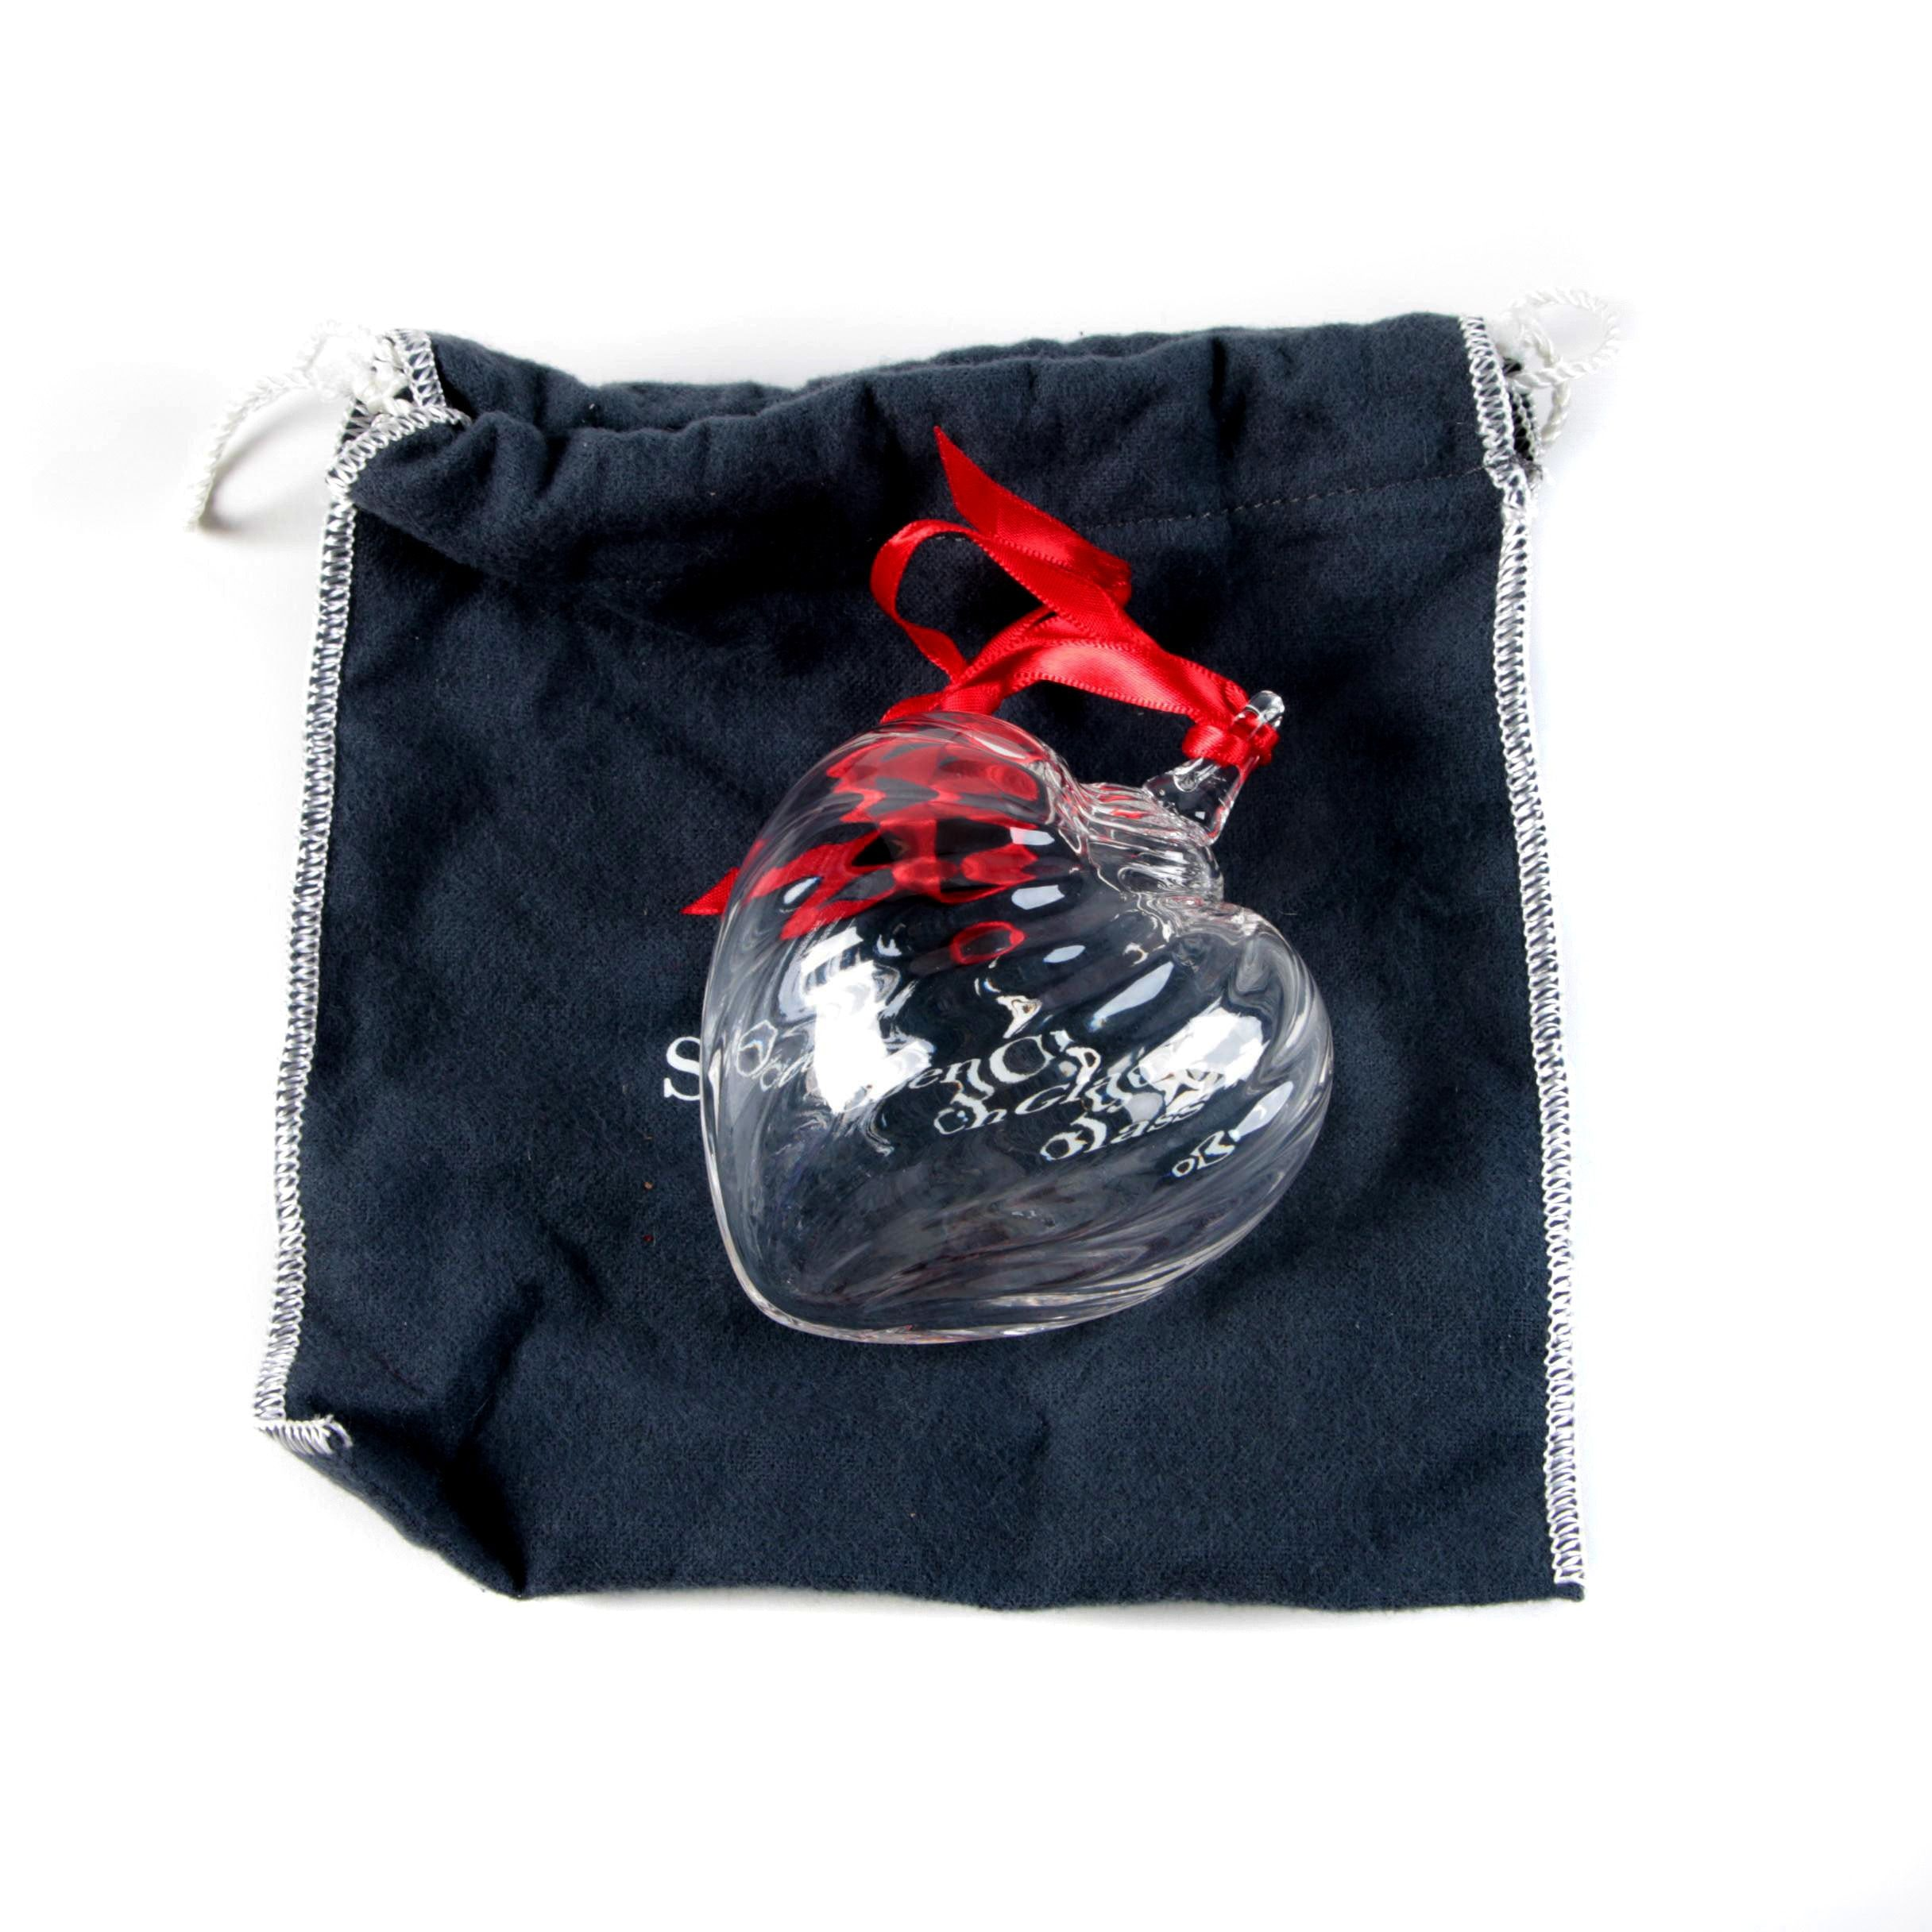 Steuben Crystal Heart Christmas Ornament